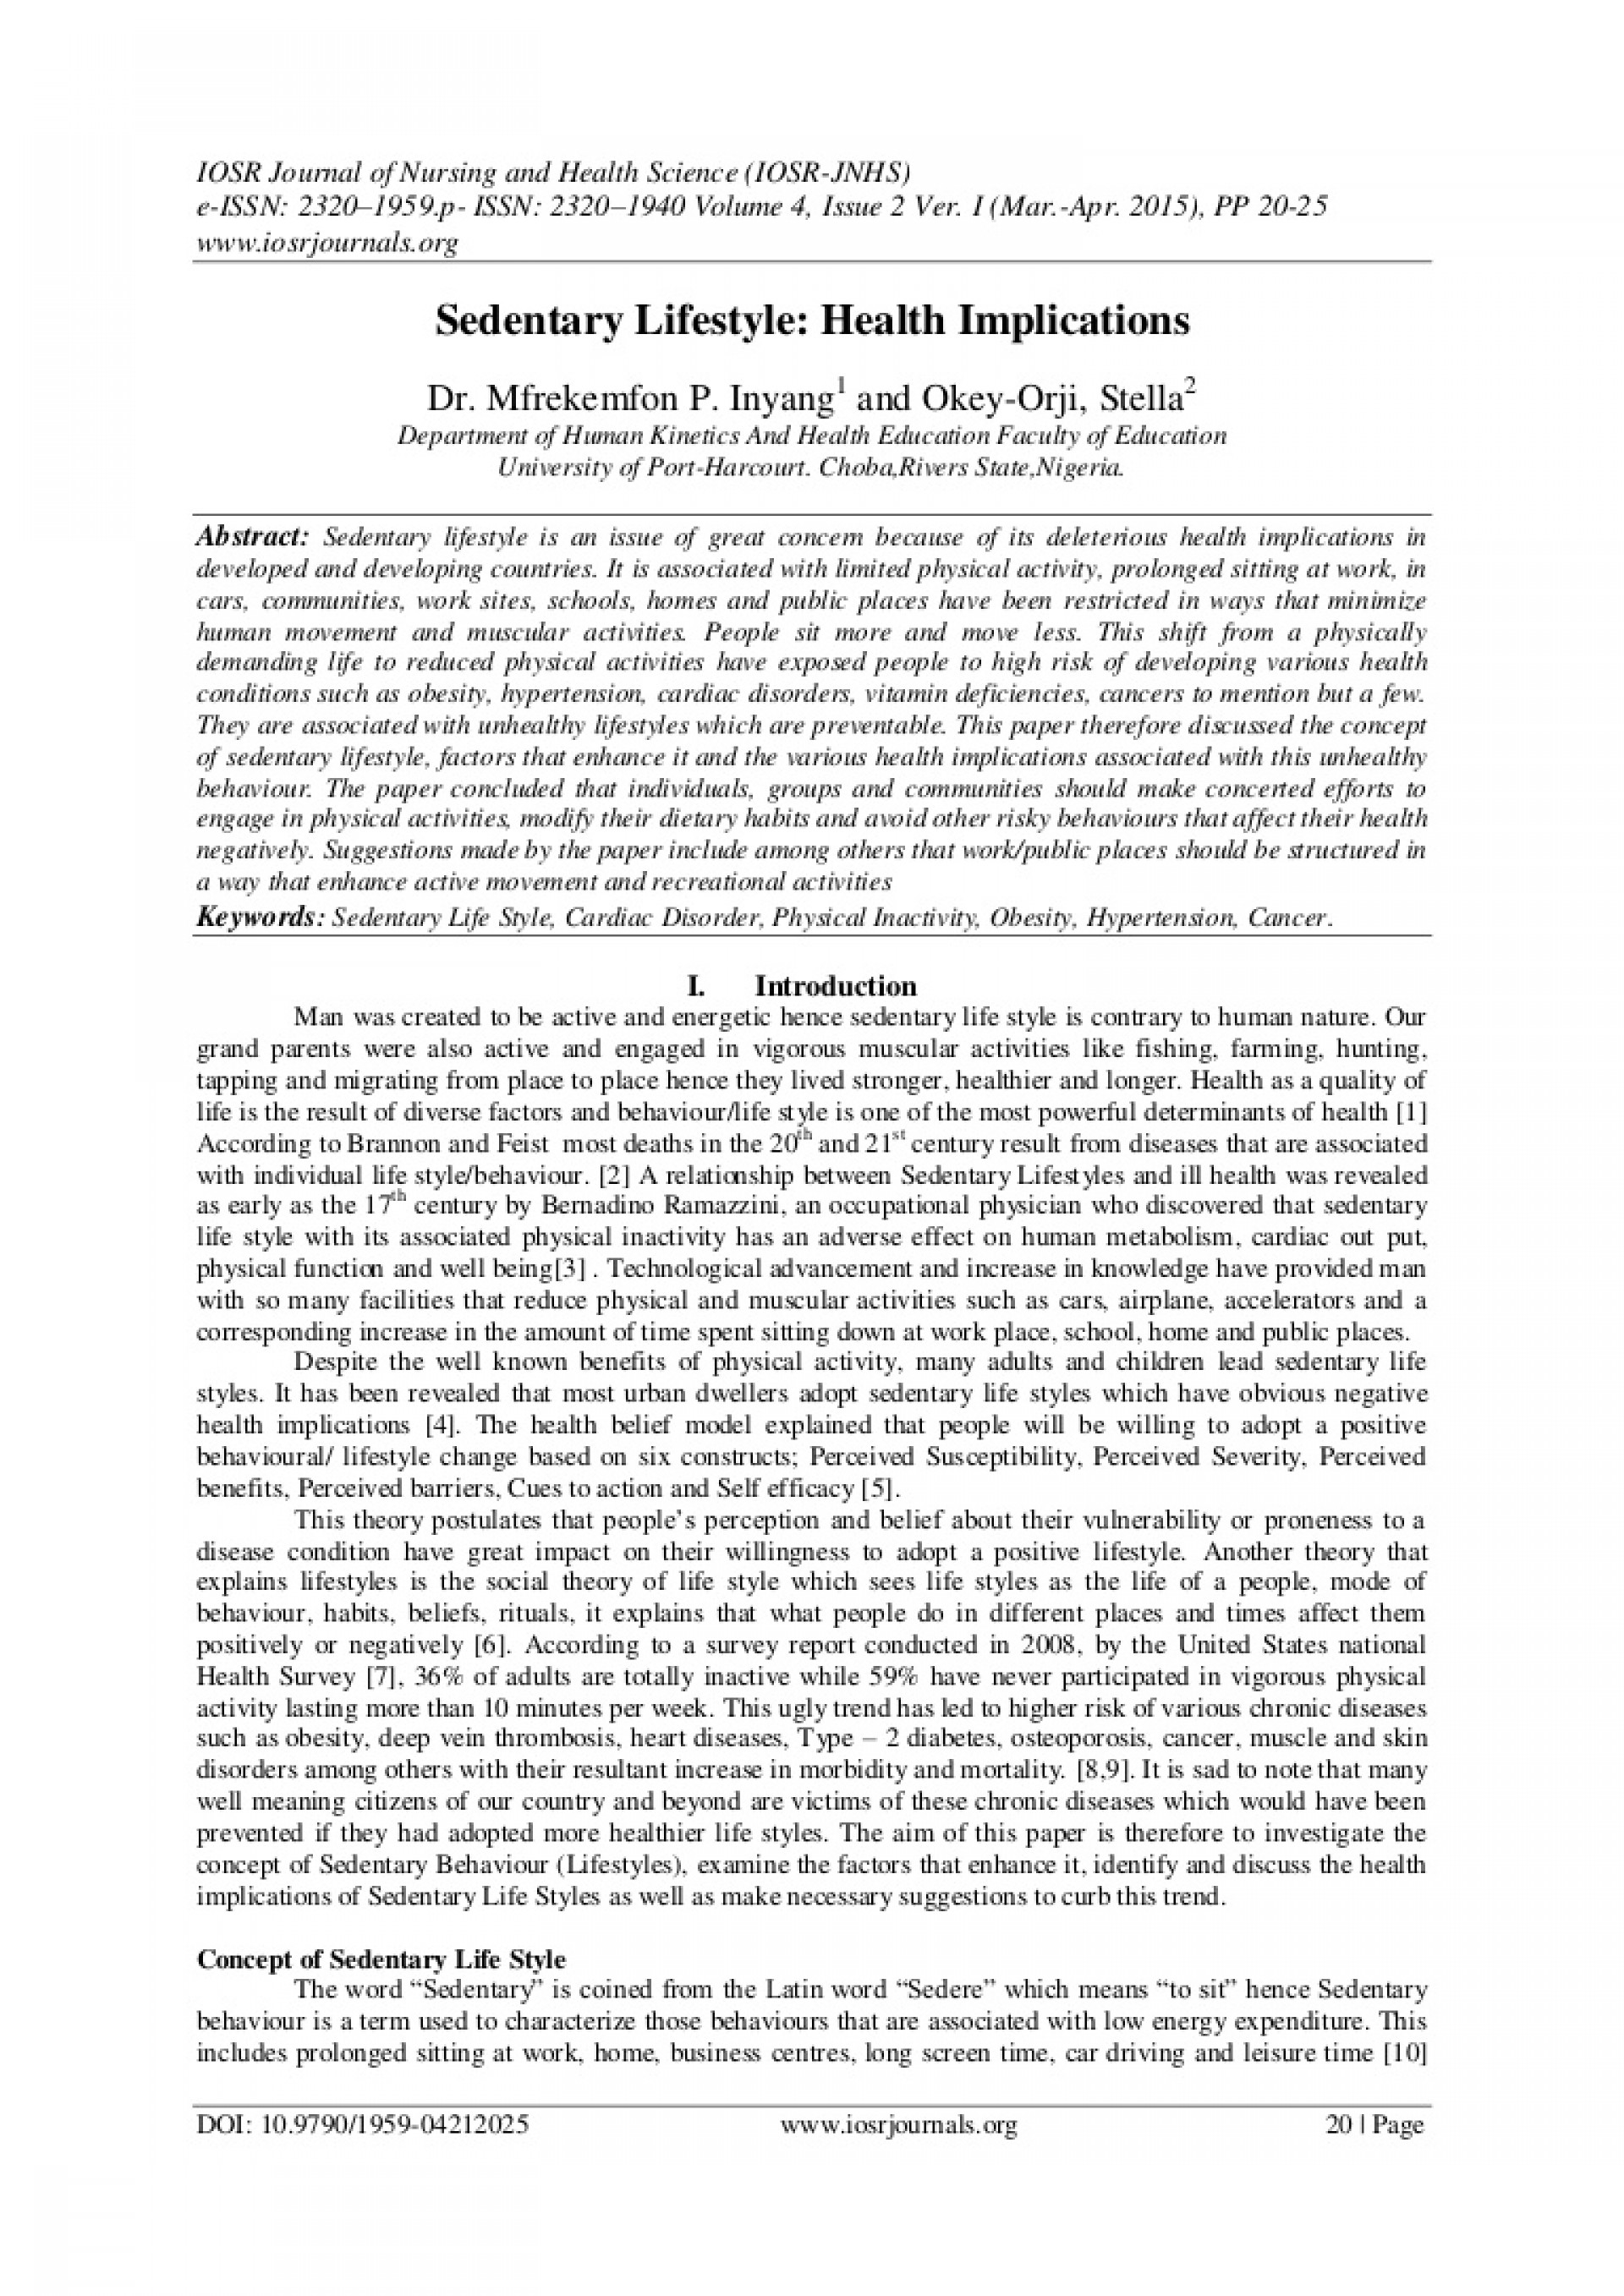 014 Lva1 App6892 Thumbnail Essay Example Lifestyle And Cardiac Beautiful Health 1920